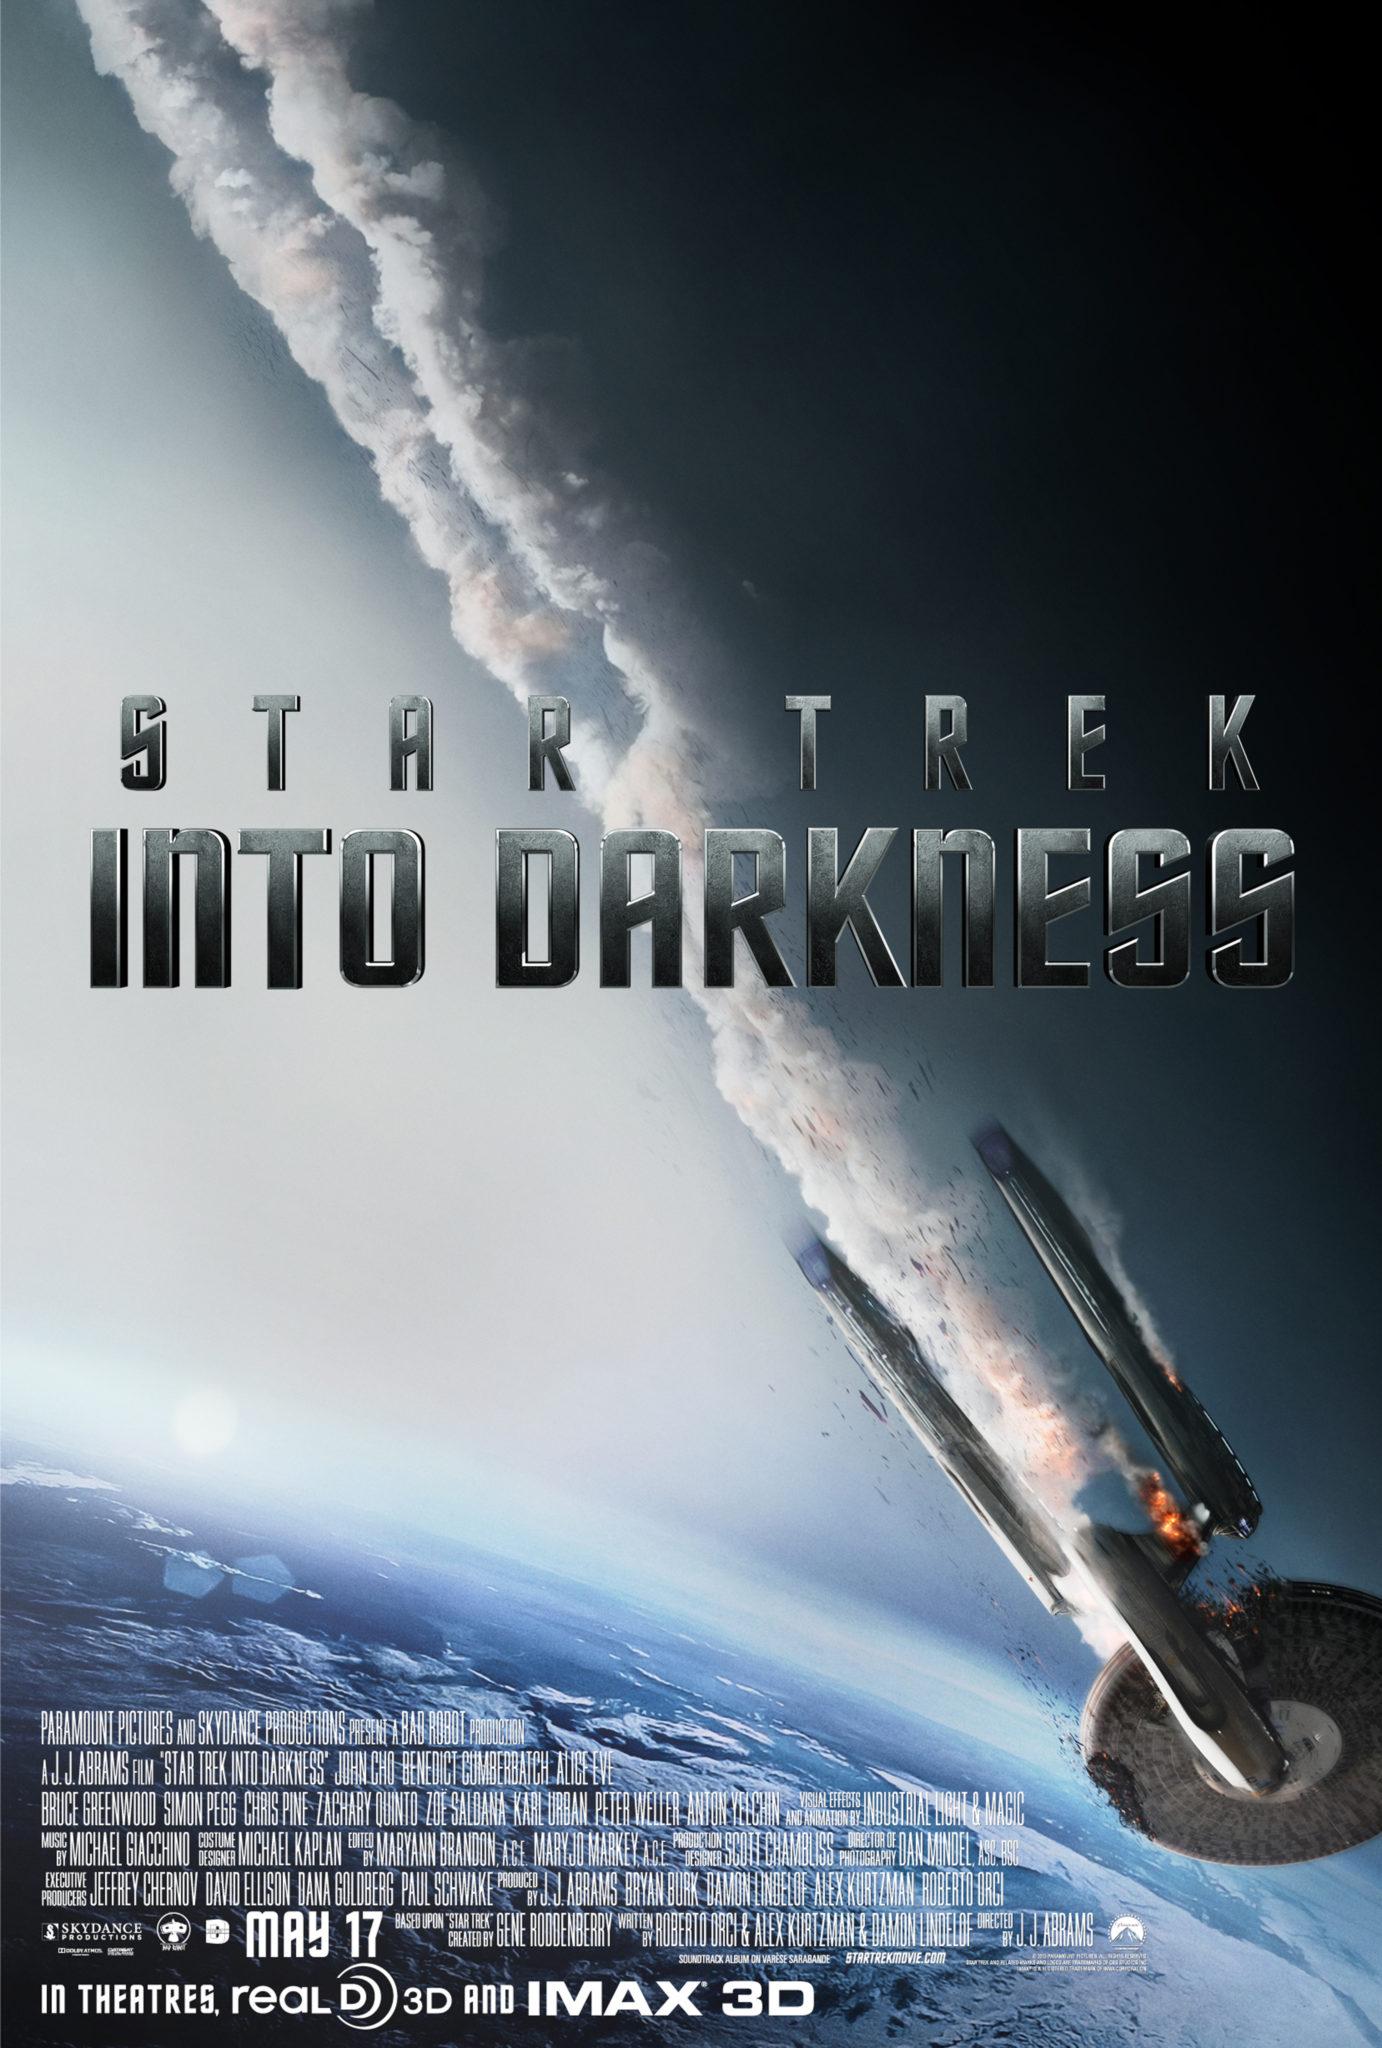 Star Trek into darkness – Poster 5